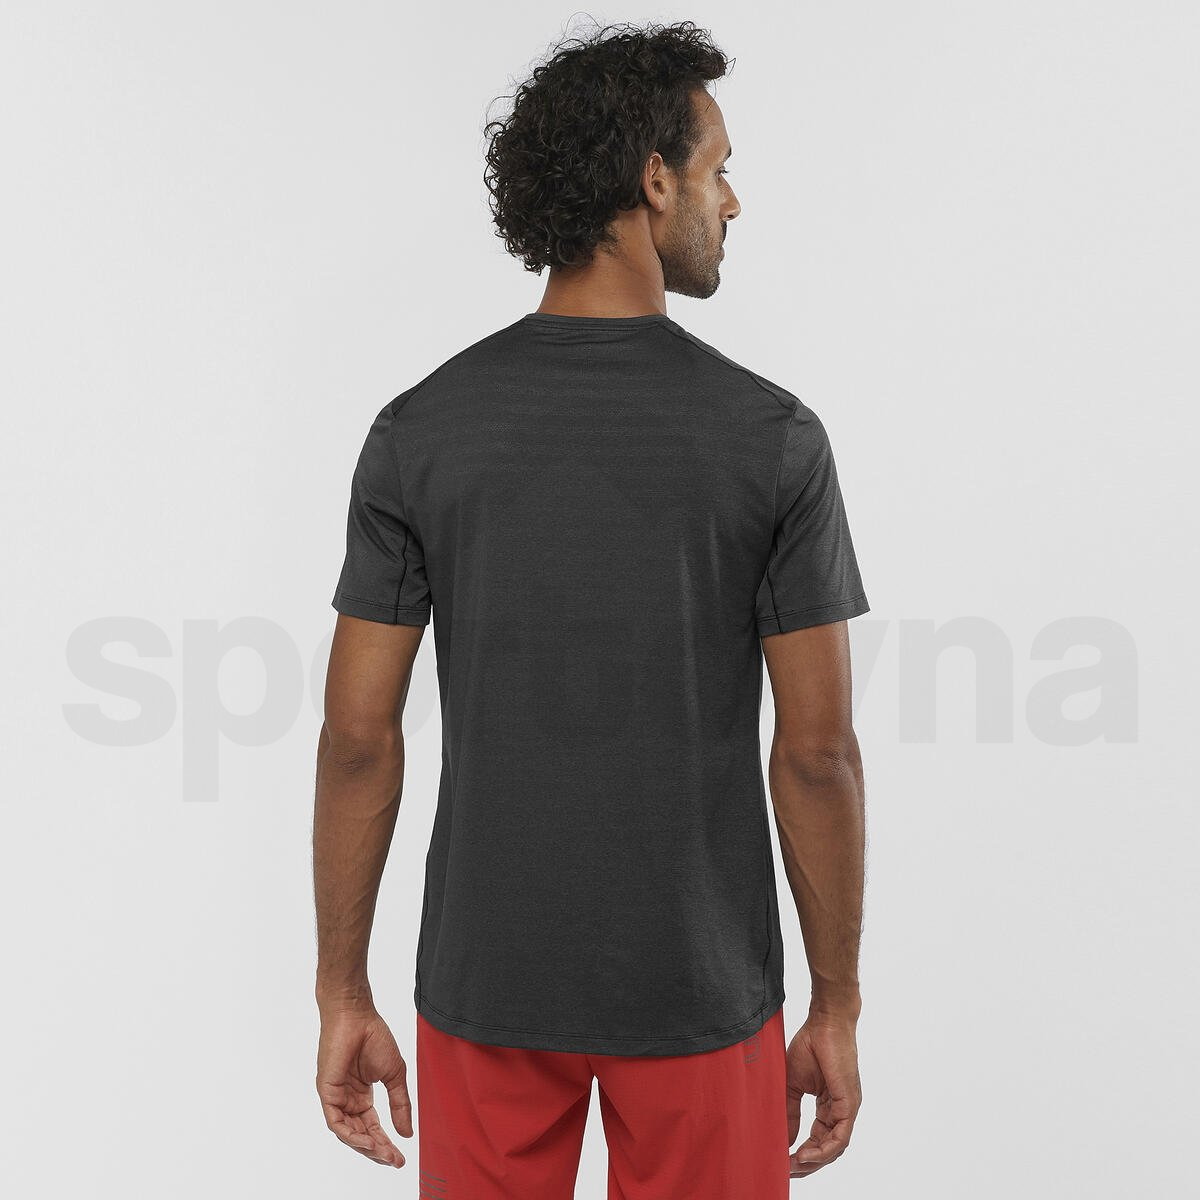 Tričko Salomon XA TEE M - černá